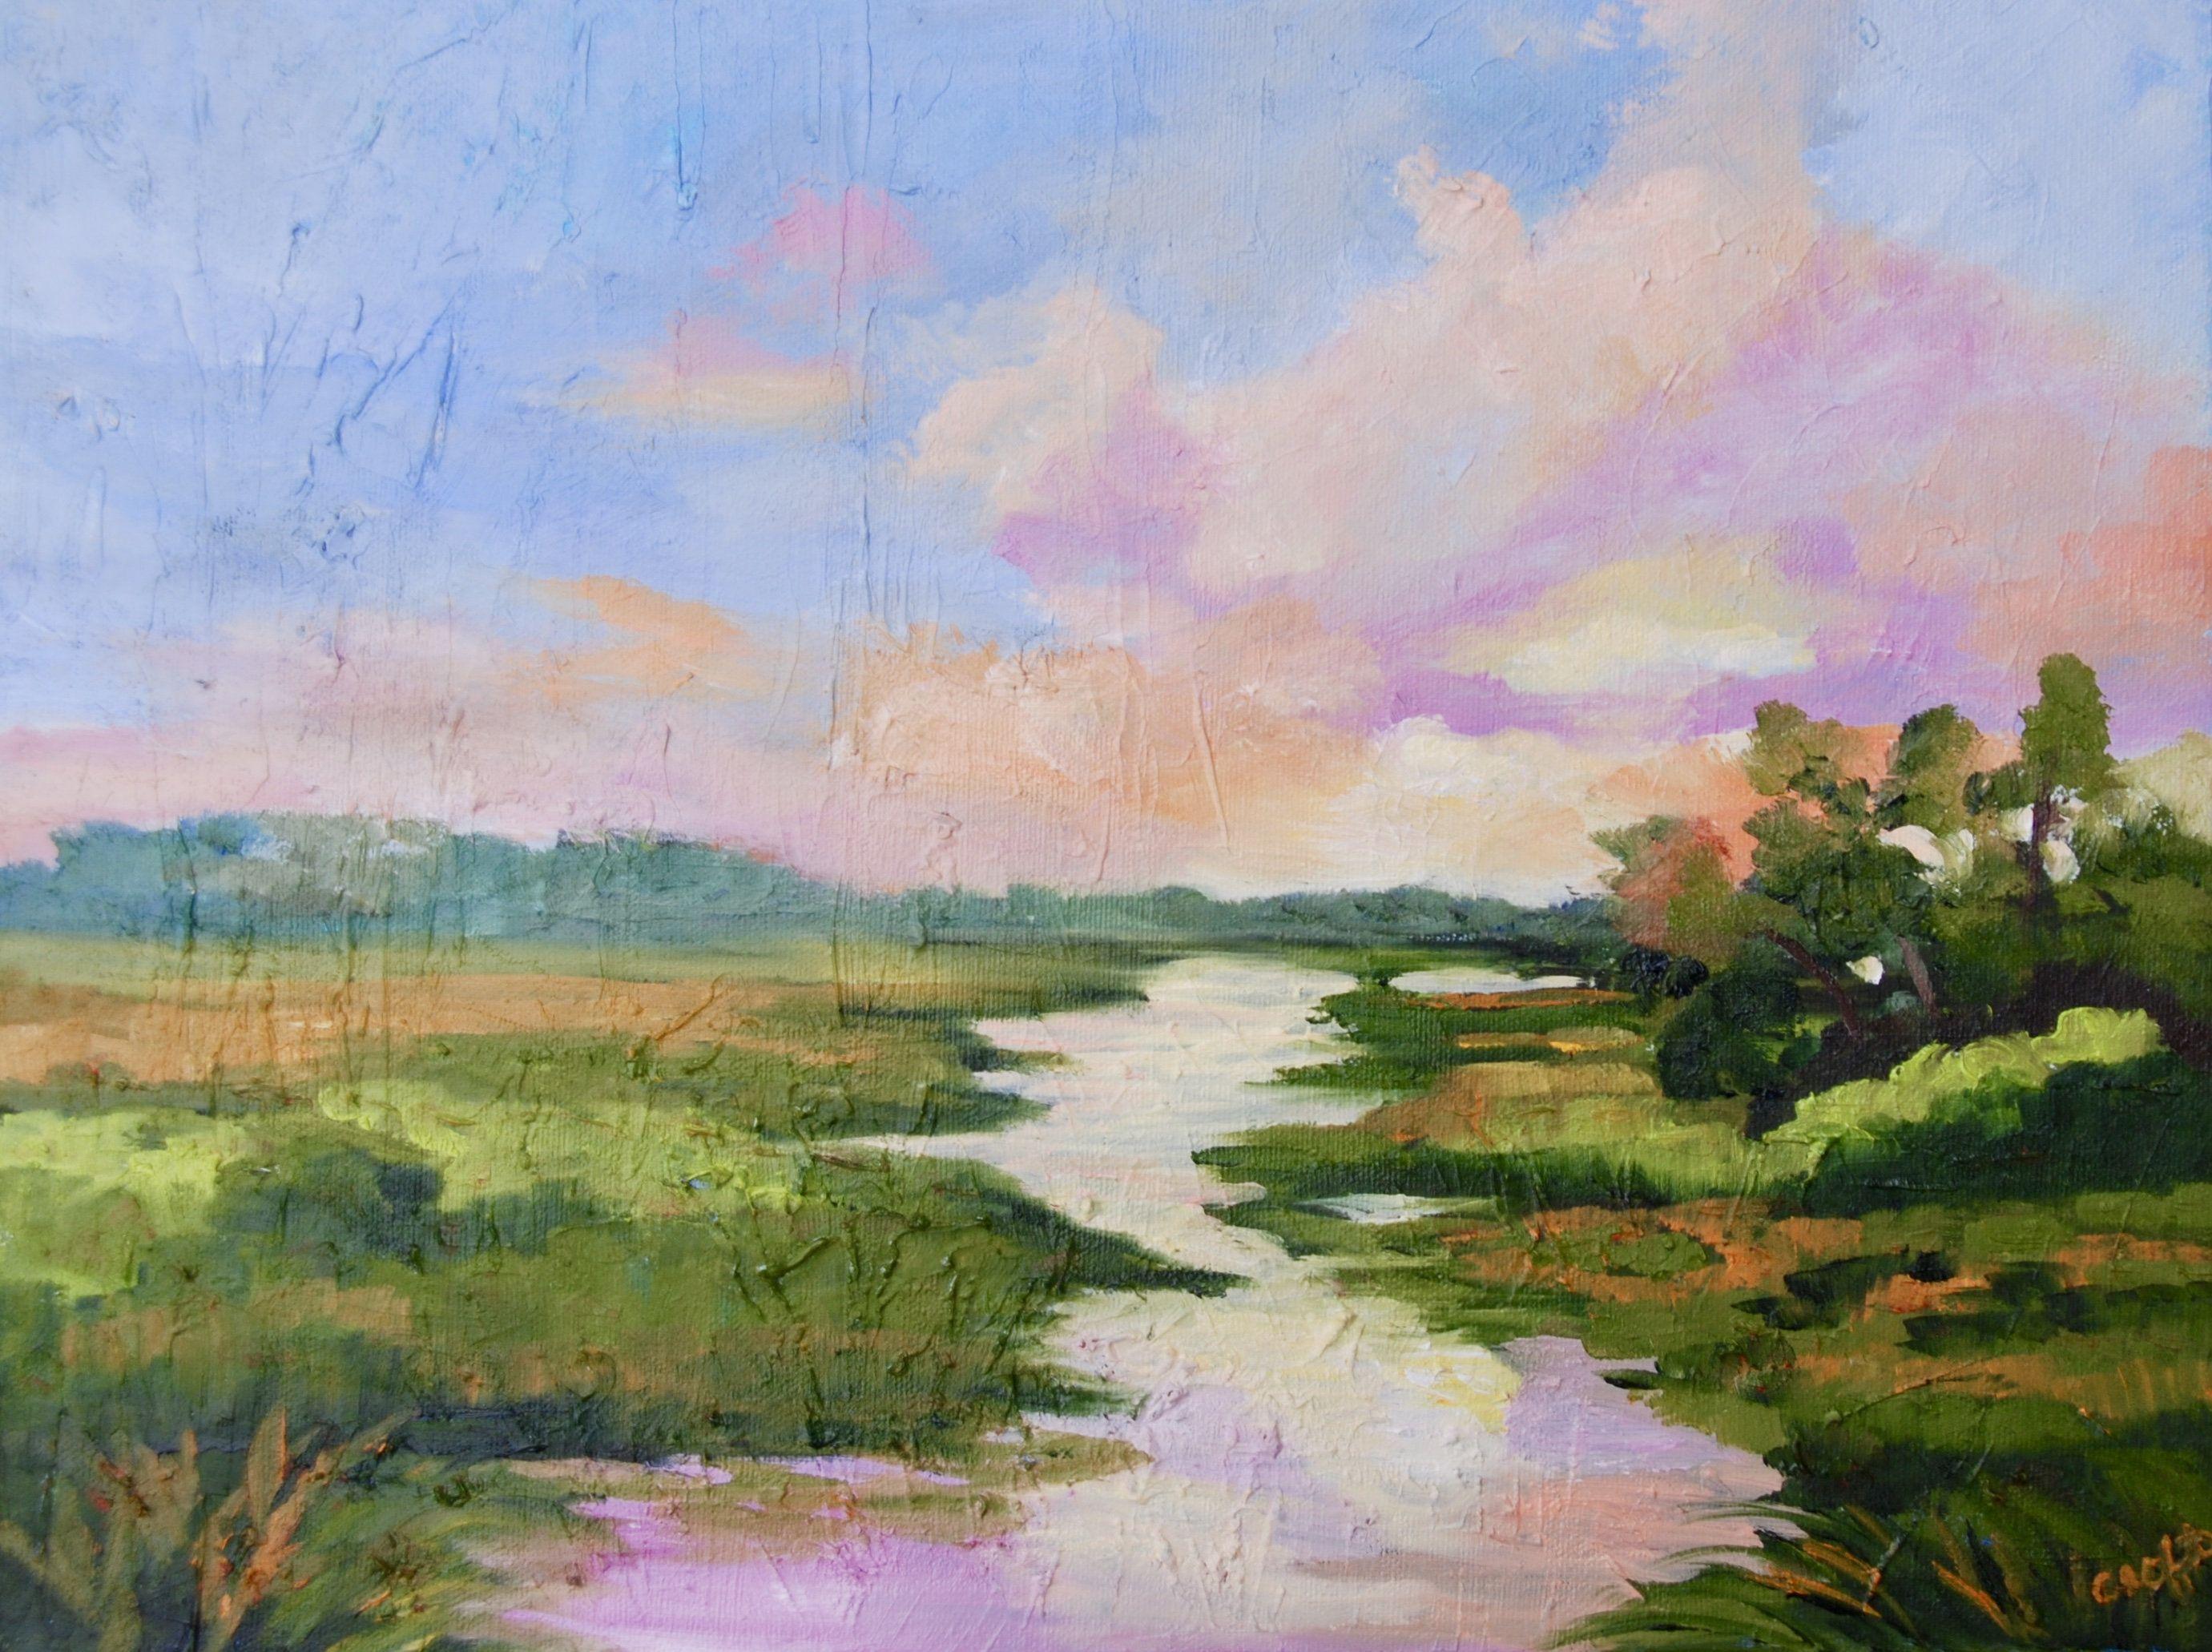 Marsh Kiawah Island Landscape Oil Painting Coastal Home Decor Modern Impressionist Painting By Rebecca Cr Oil Painting Abstract Oil Painting Landscape Painting